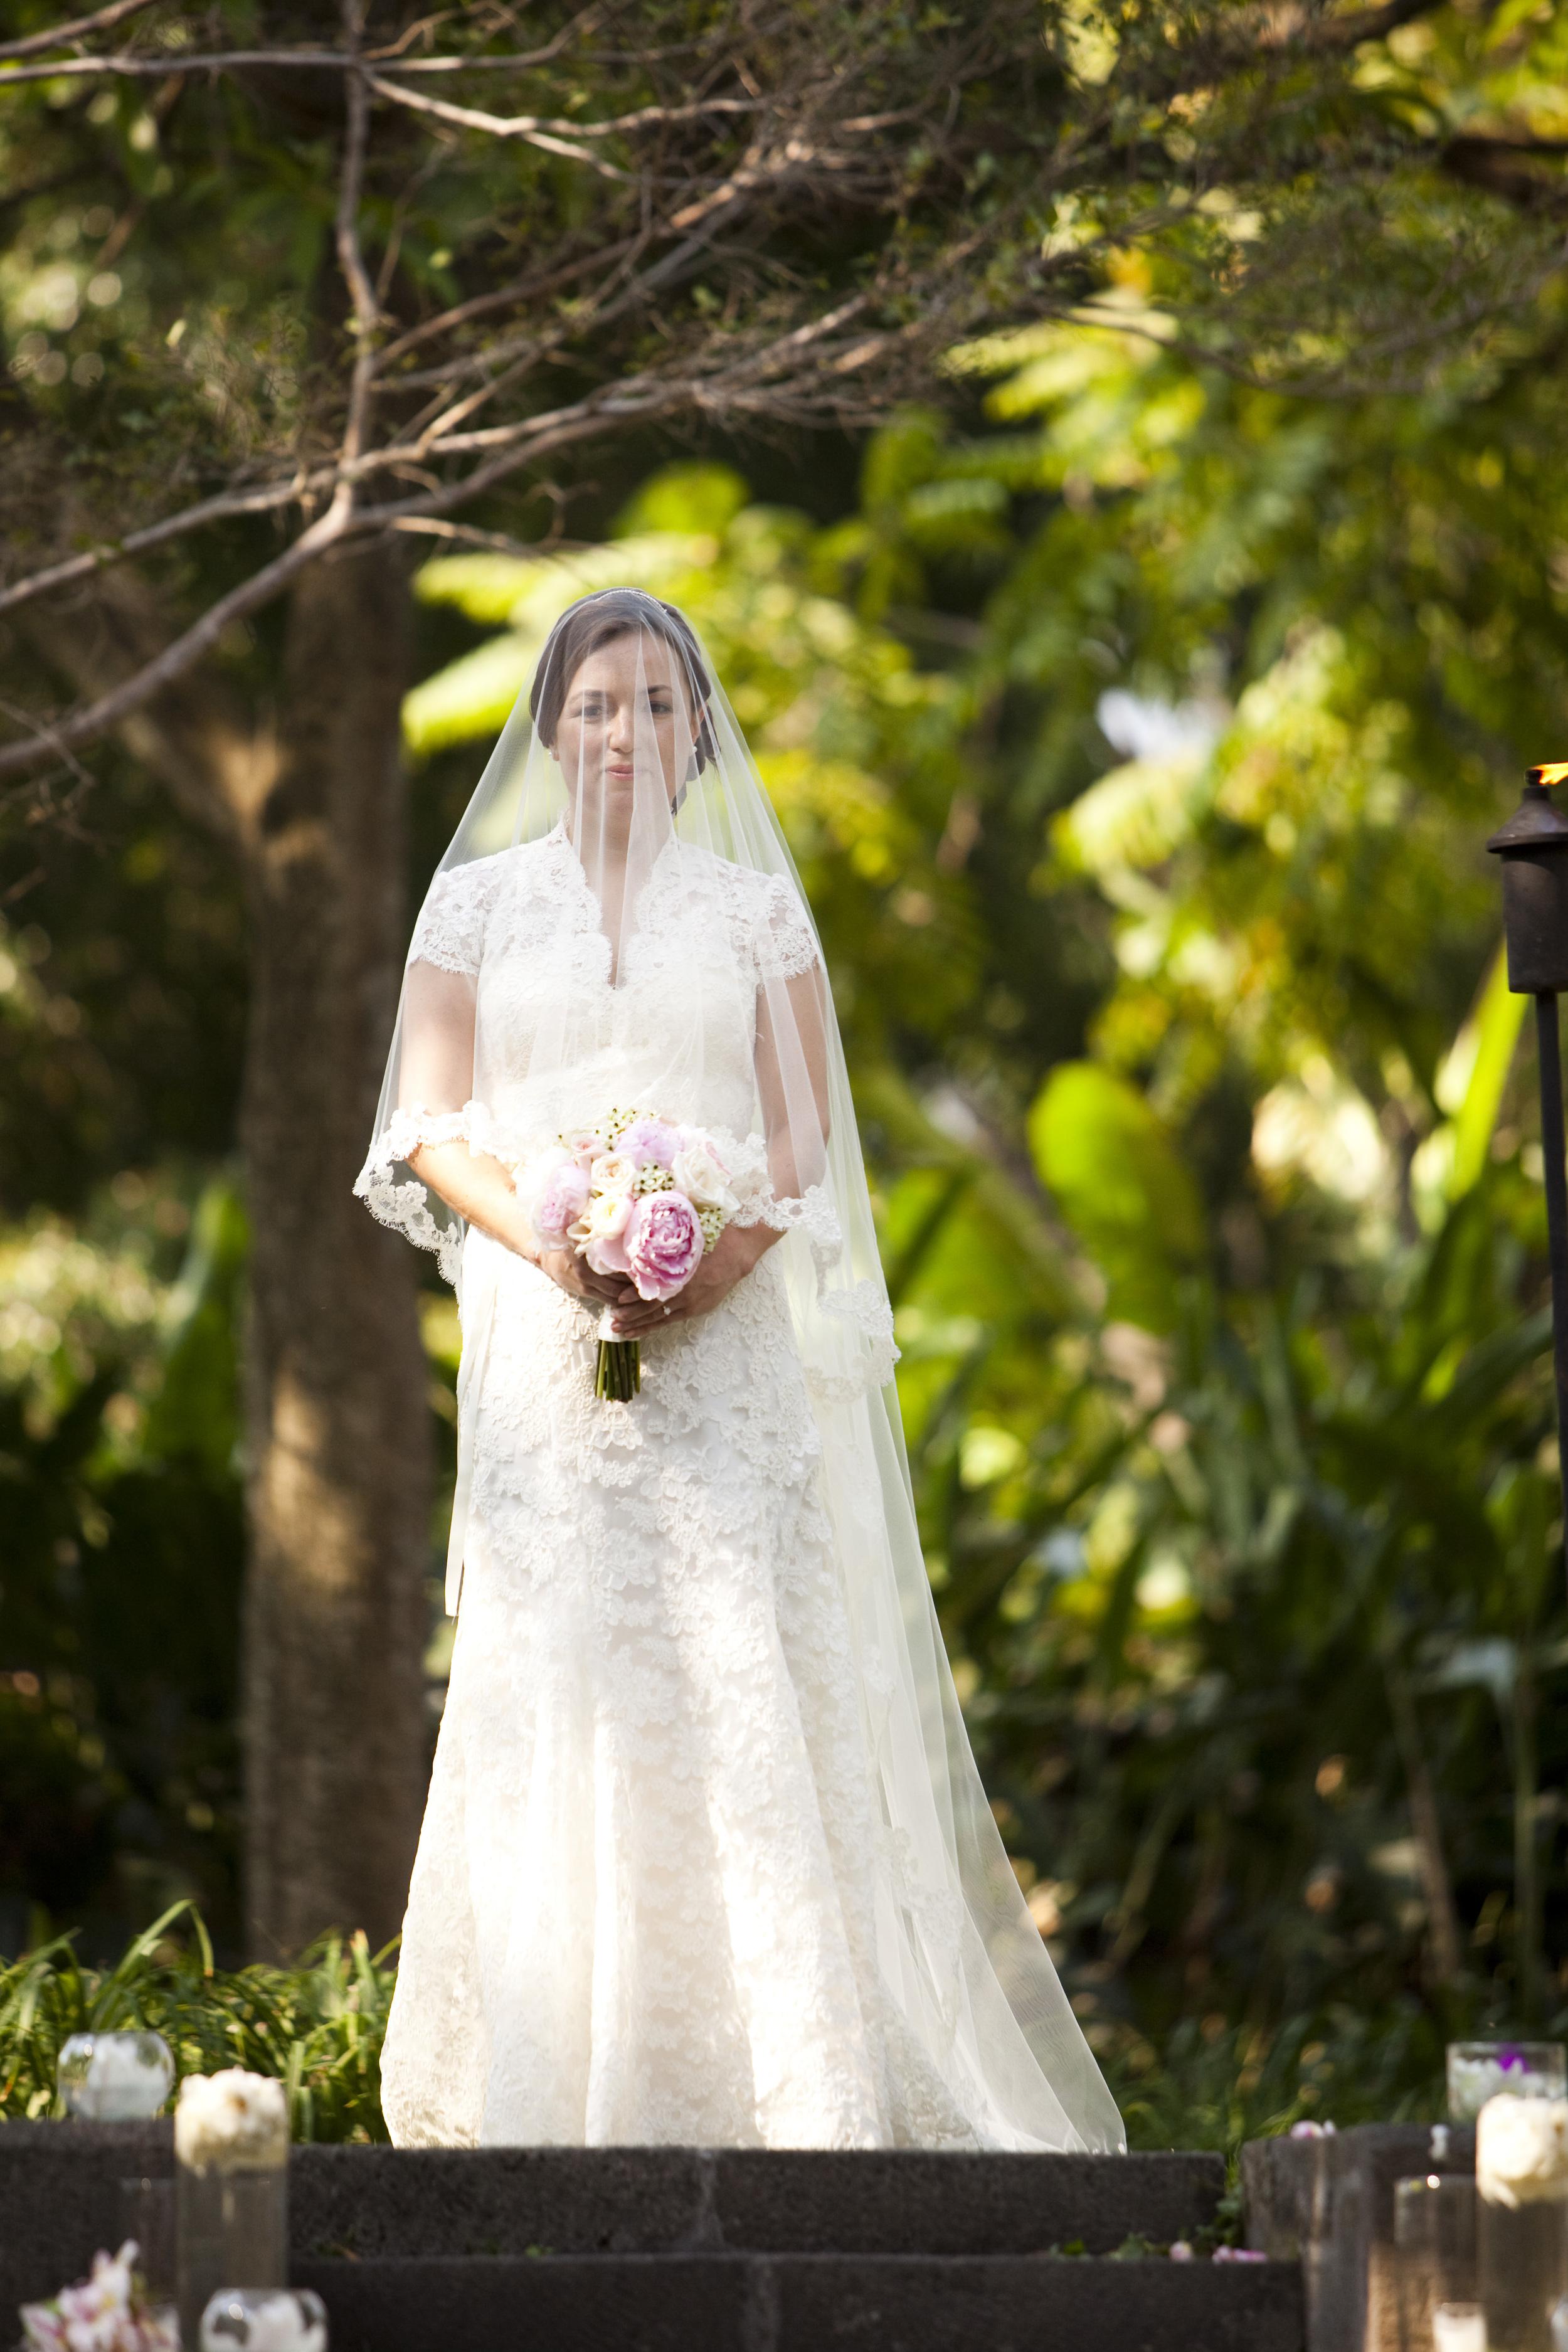 Ceci_New_York_Style_Luxury_Custom_Mexico_Wedding_CeciBride_Letterpress_NewYork_Foil_Hacienda_de_San_Antonio_15.jpg